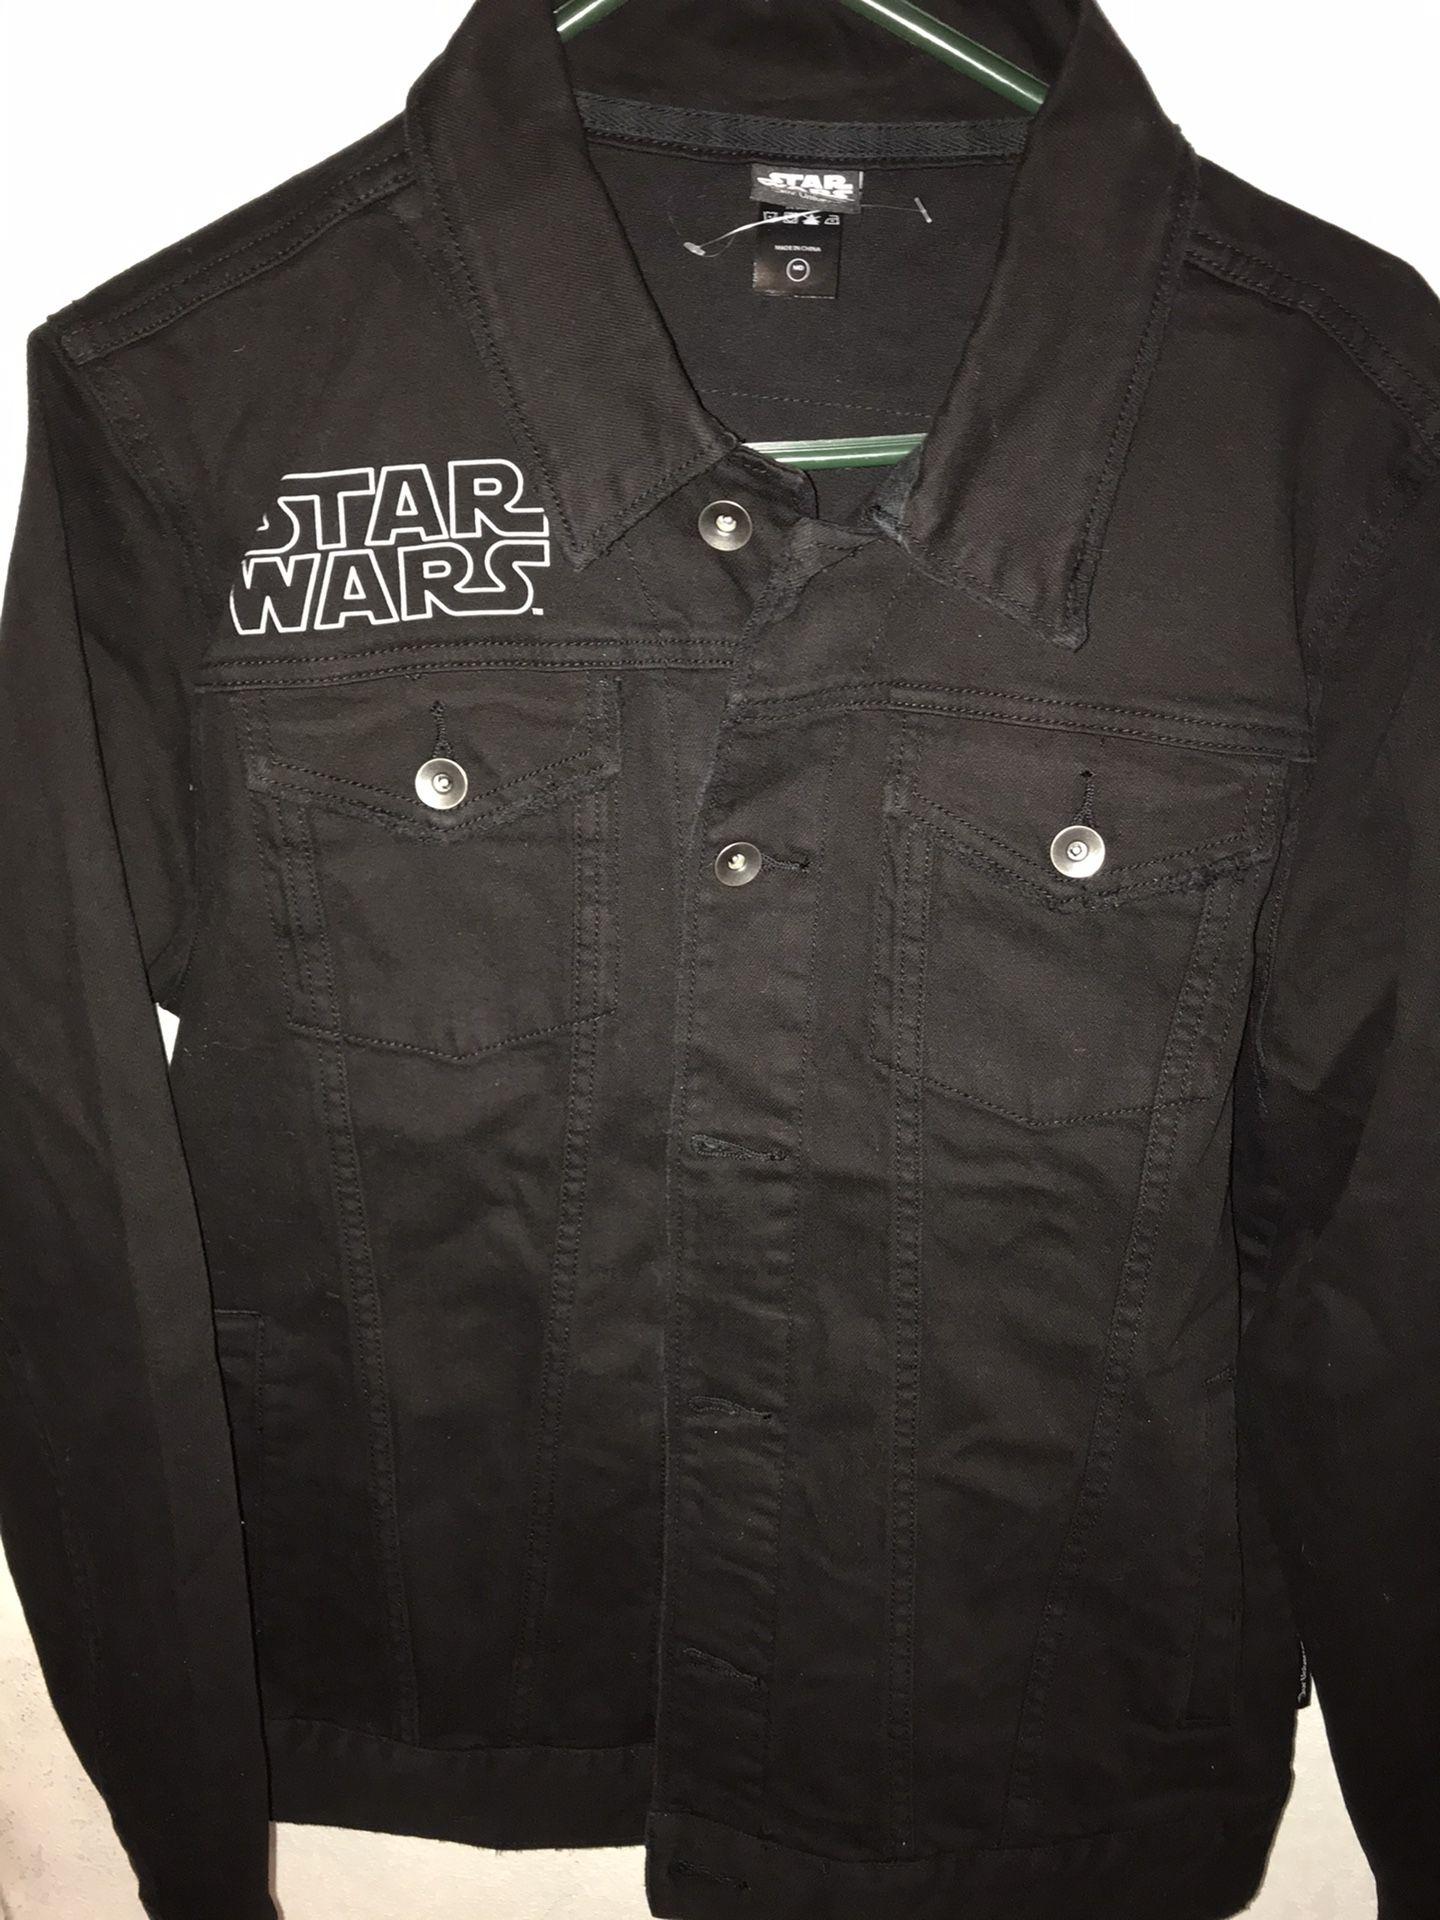 Star Wars Black Denim Jacket